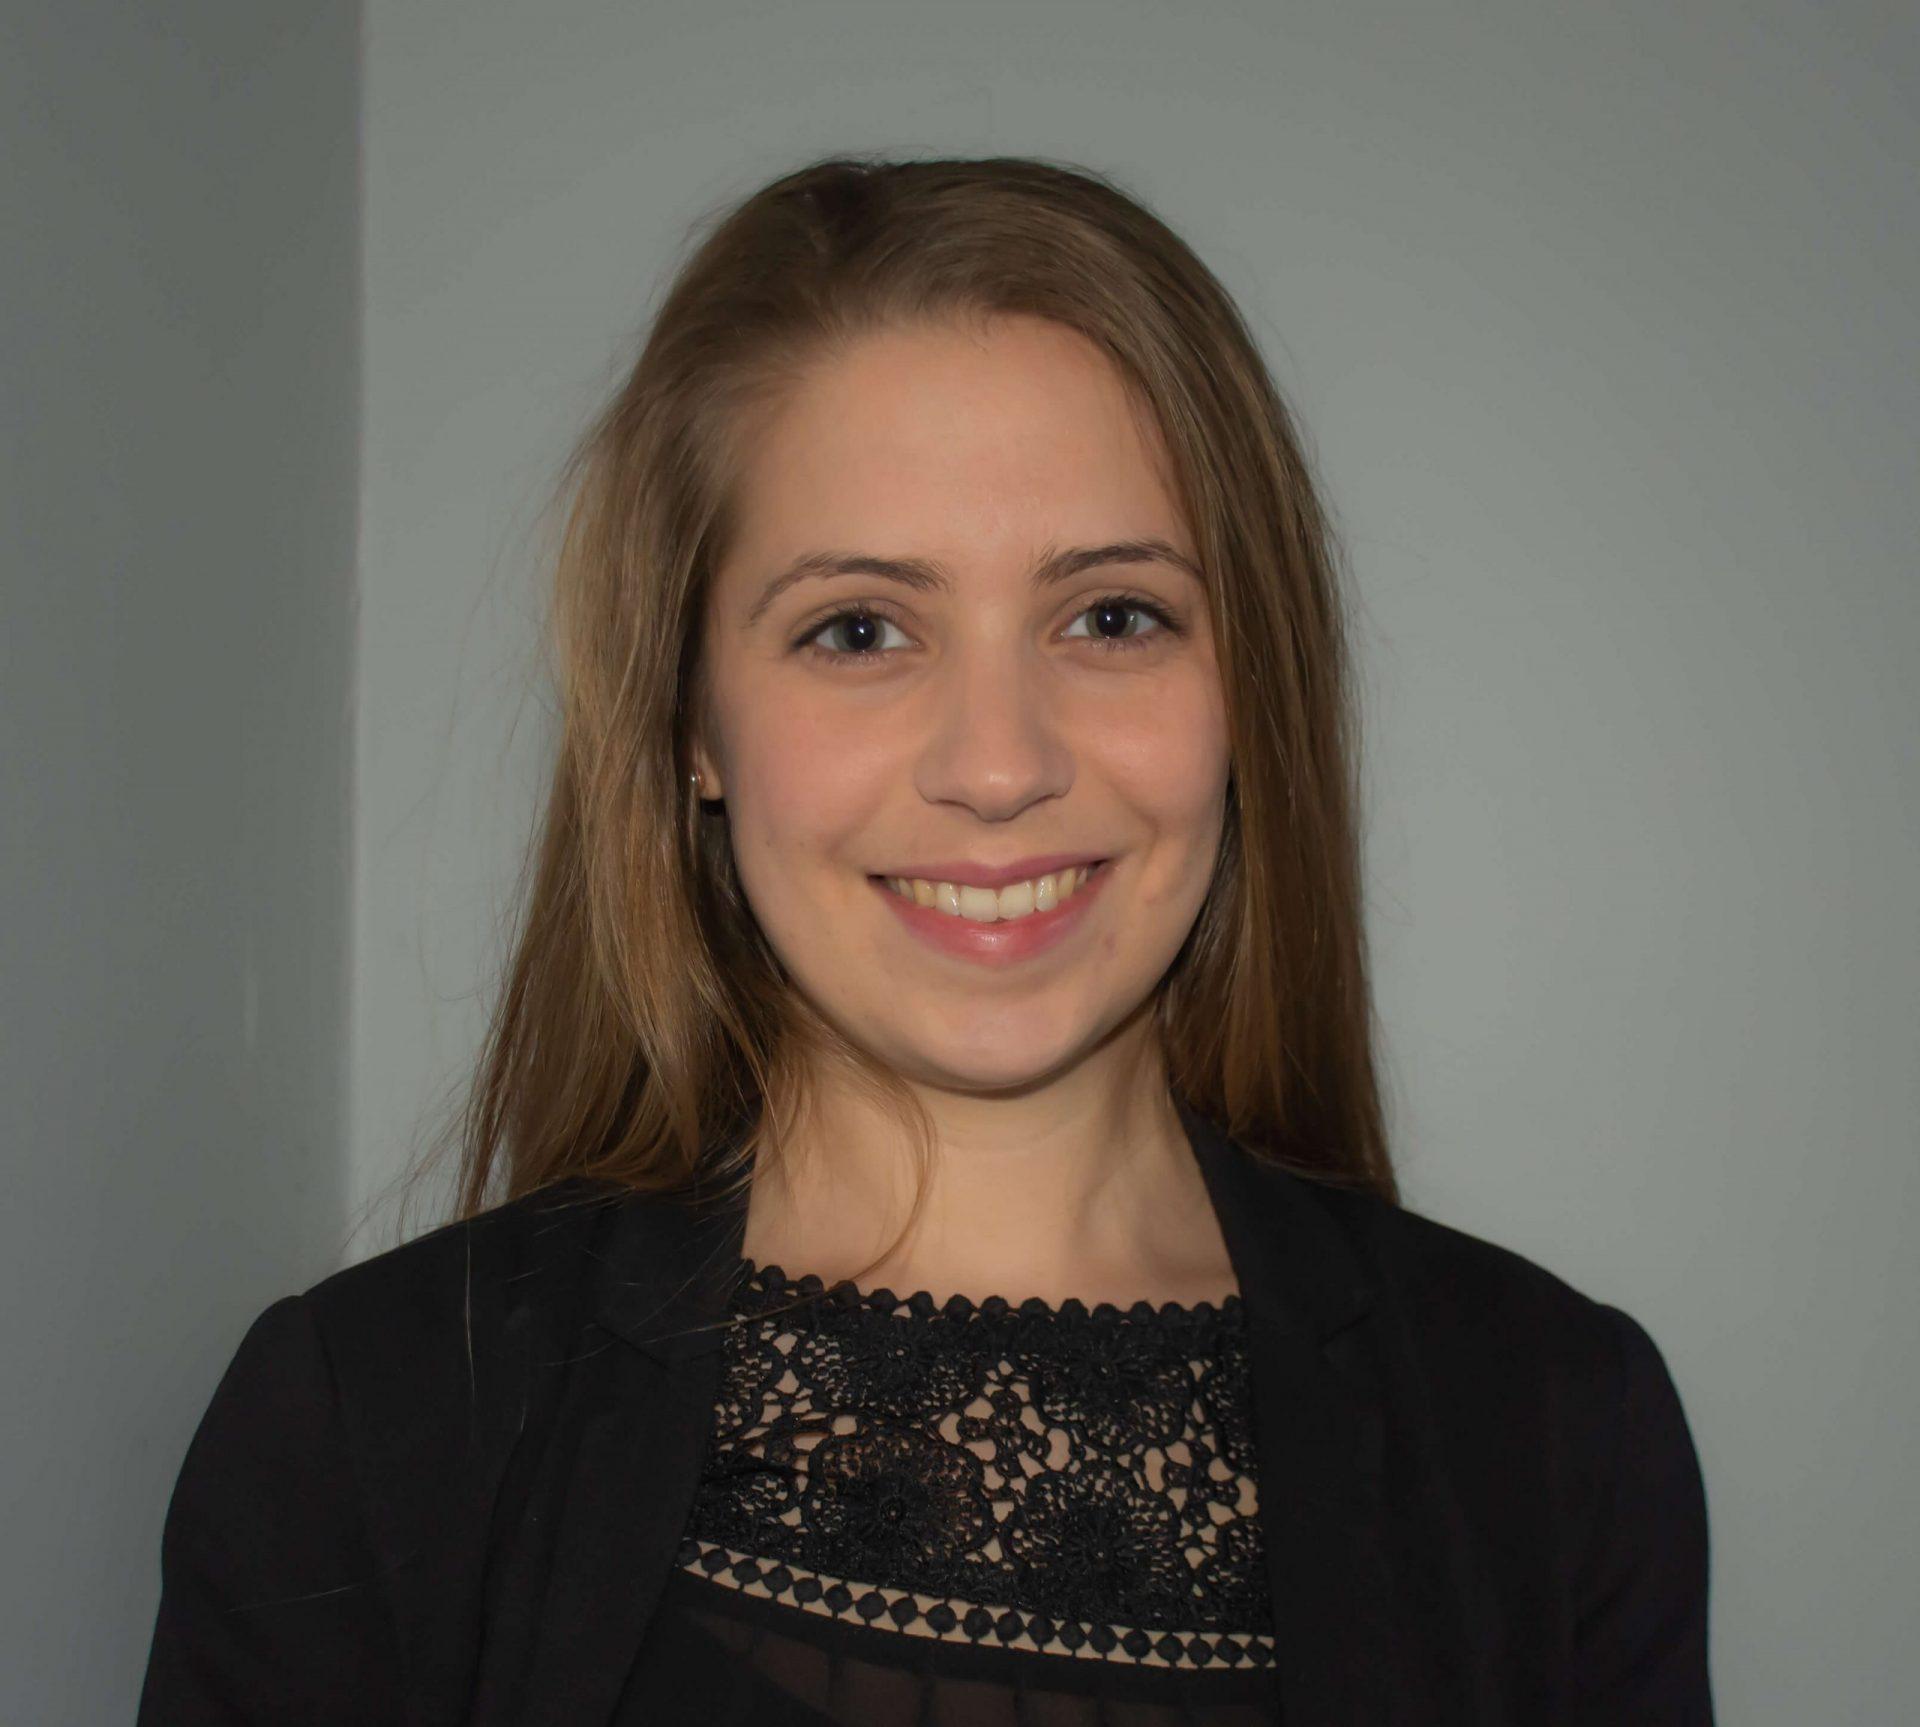 Gaëlle Dumel Neuropsychologue Montreal